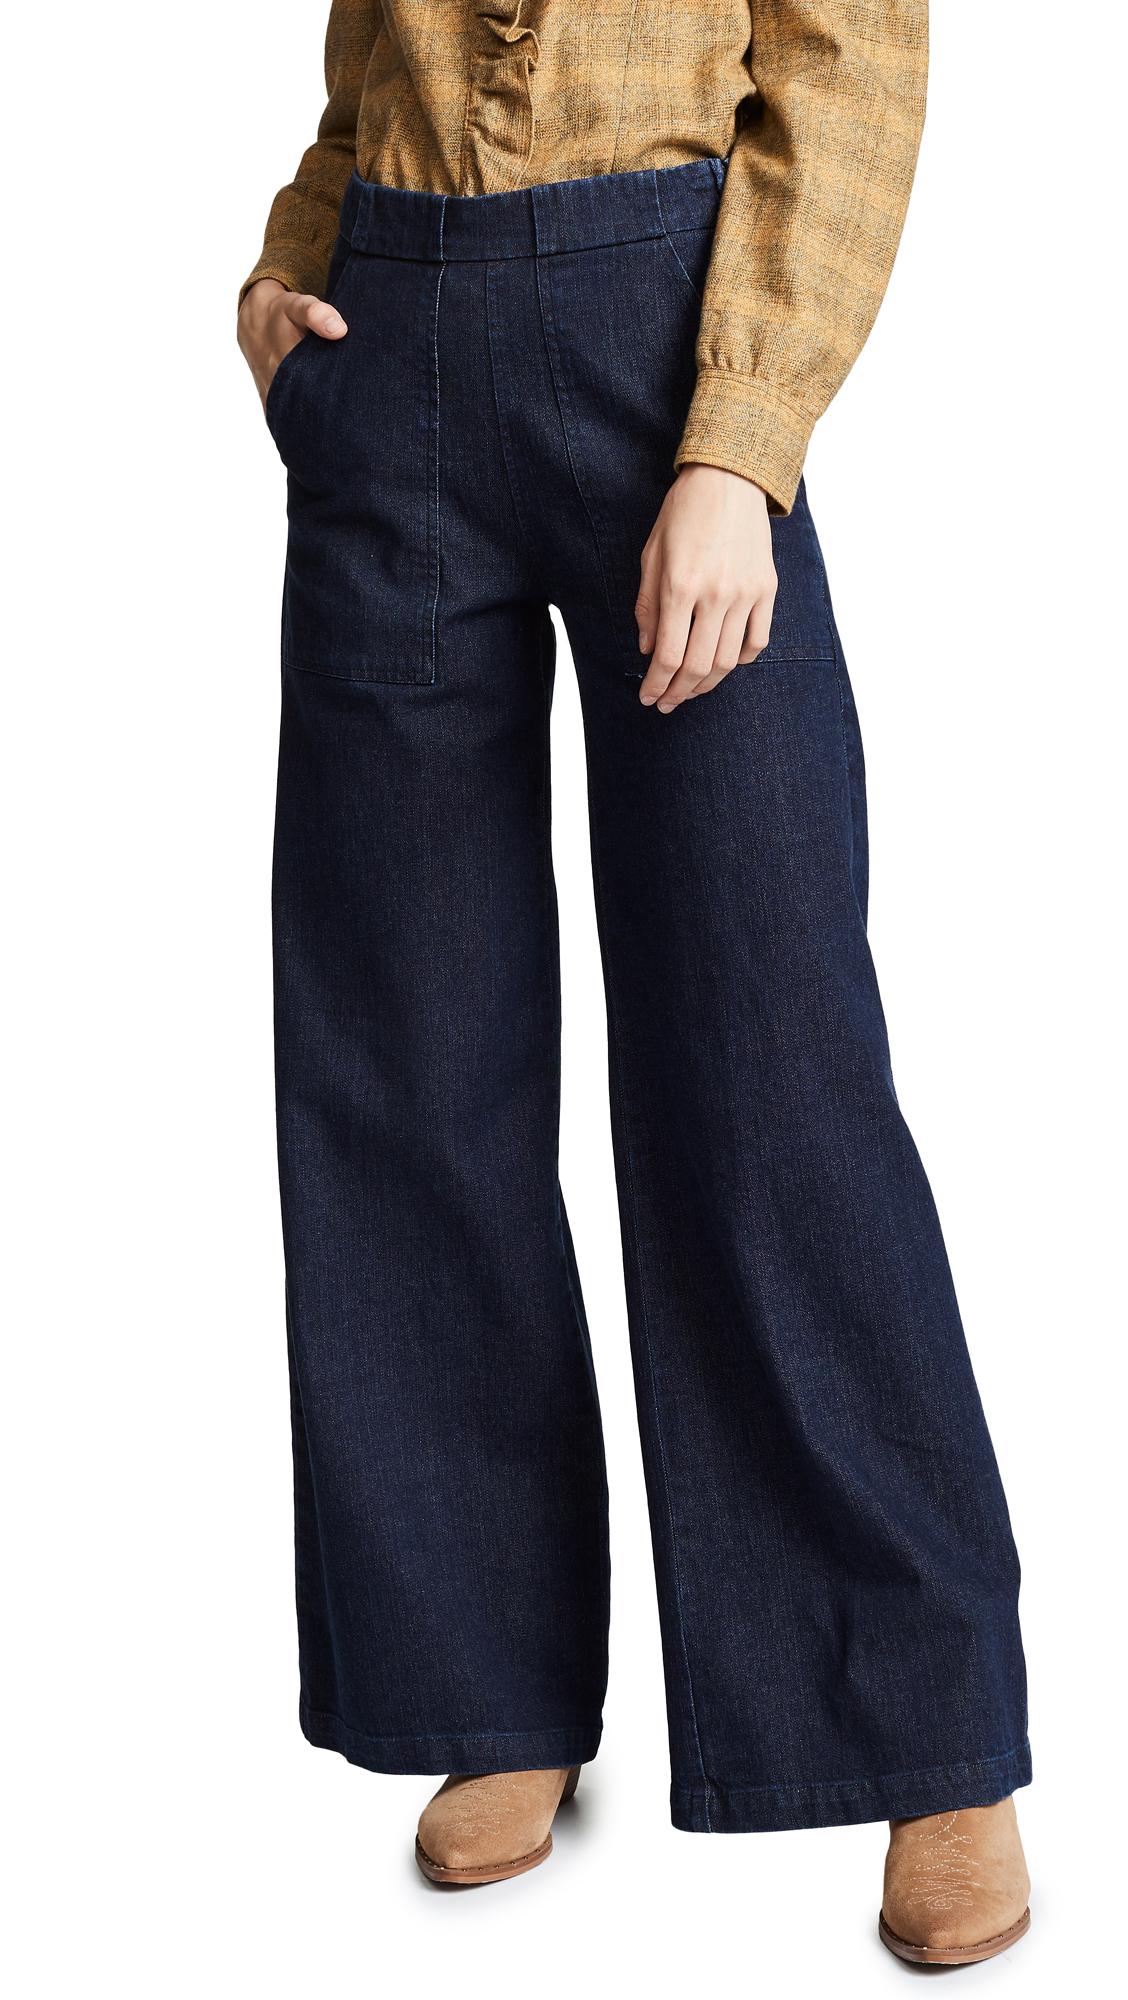 Loup Sabrina Jeans In Dark Indigo